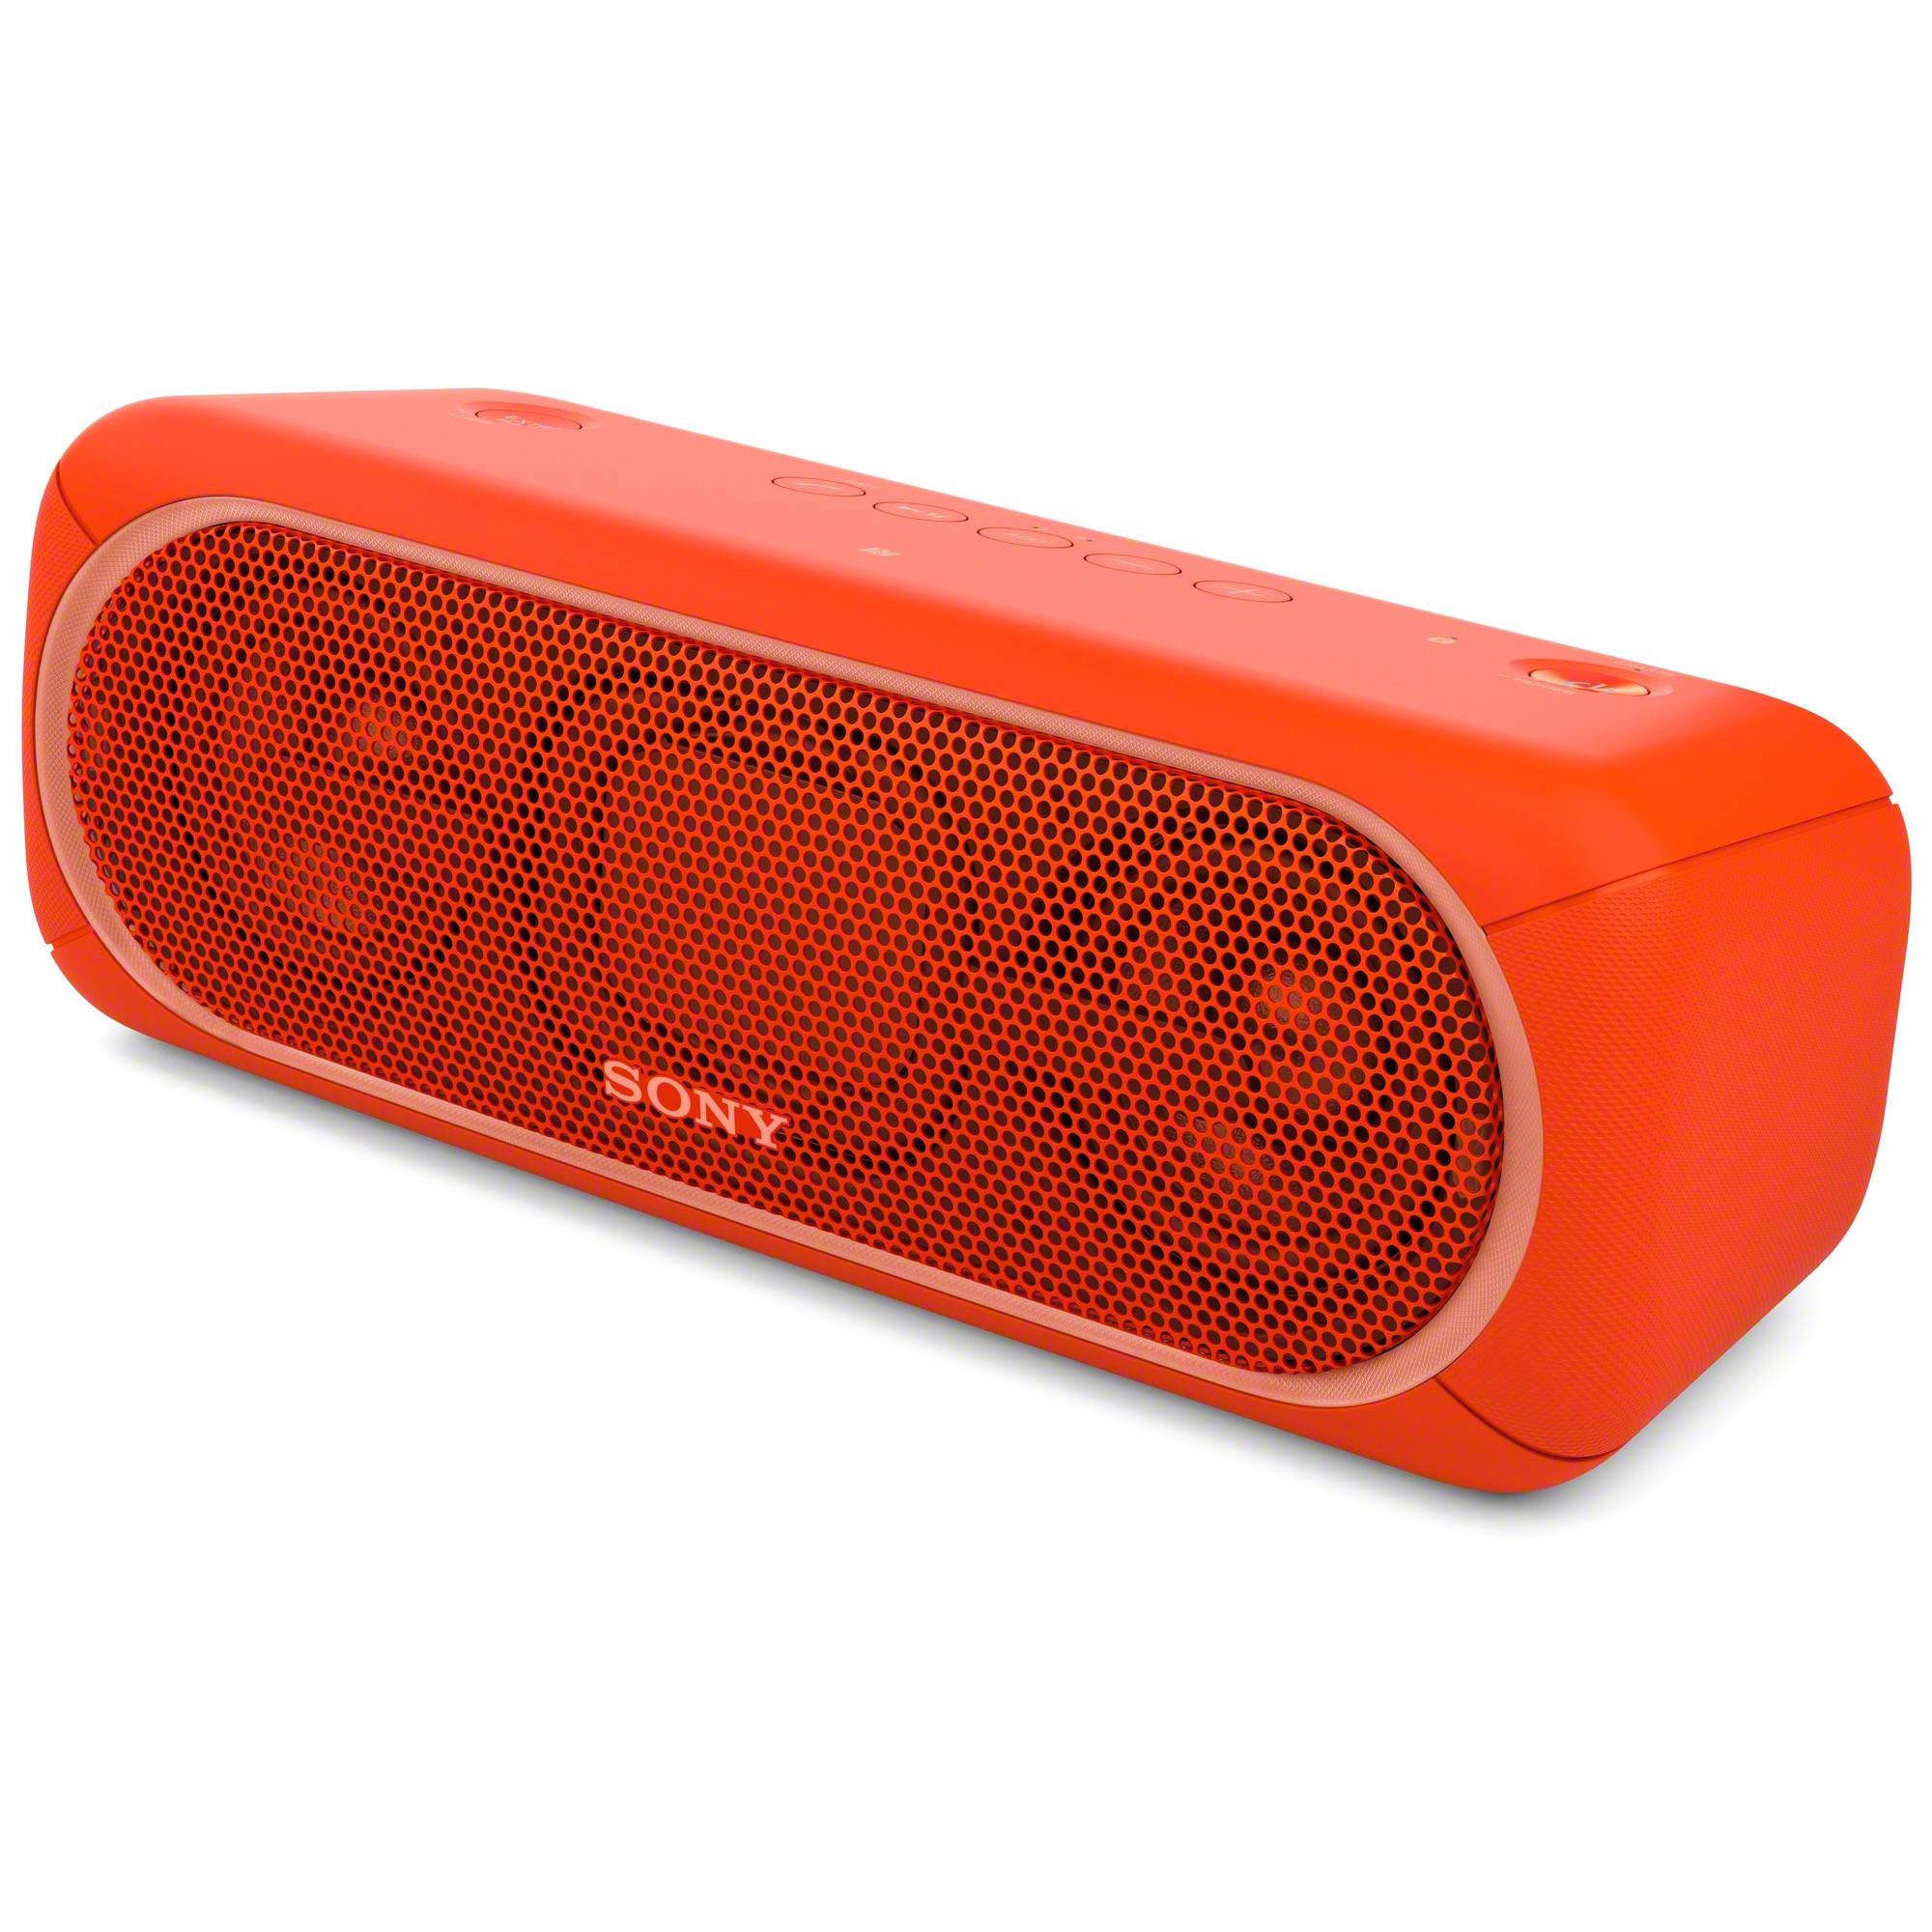 Sony SRS-XB40 Bluetooth Ηχείο Red (Πληρωμή έως 12 δόσεις)